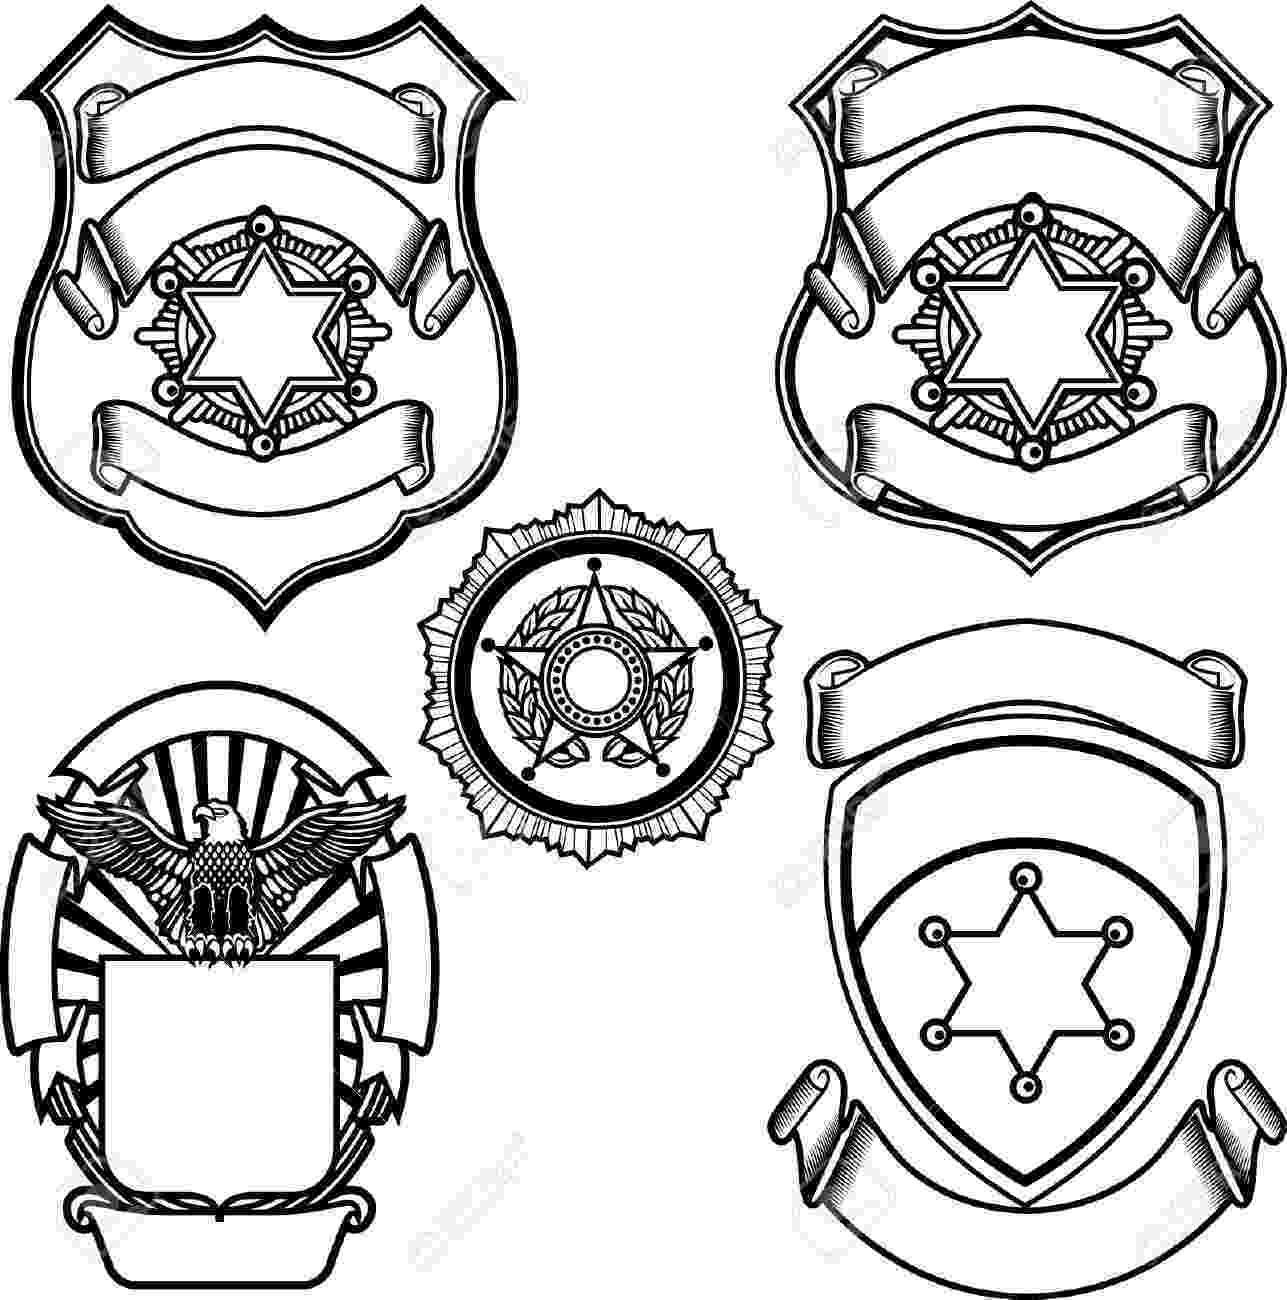 free printable police badge template sheriff badge template free printable templates free police badge template printable